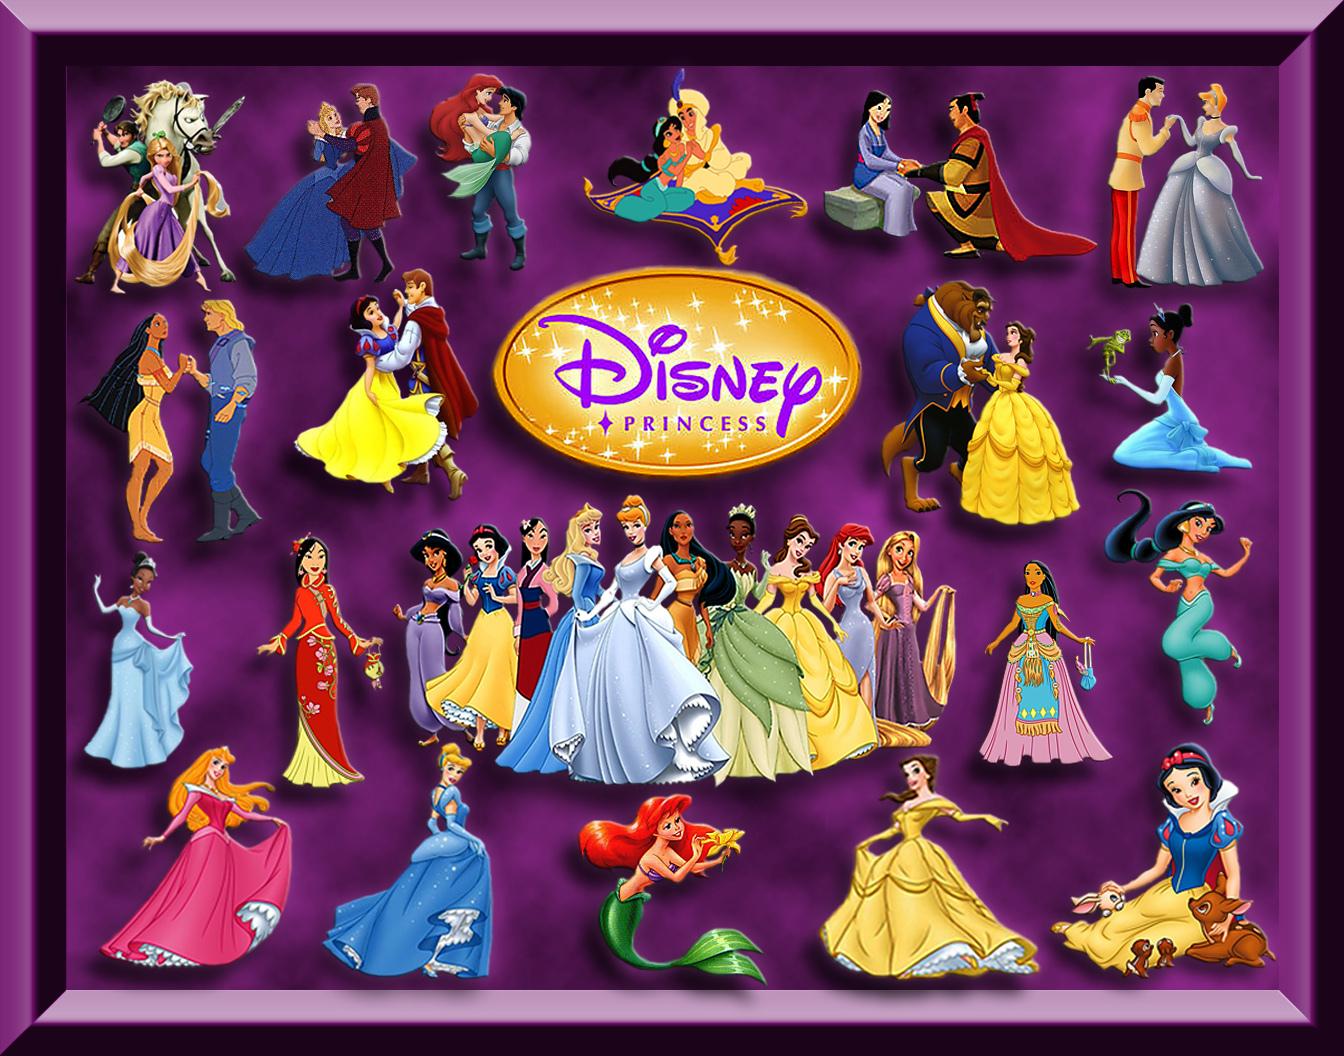 Disney Princess Collage